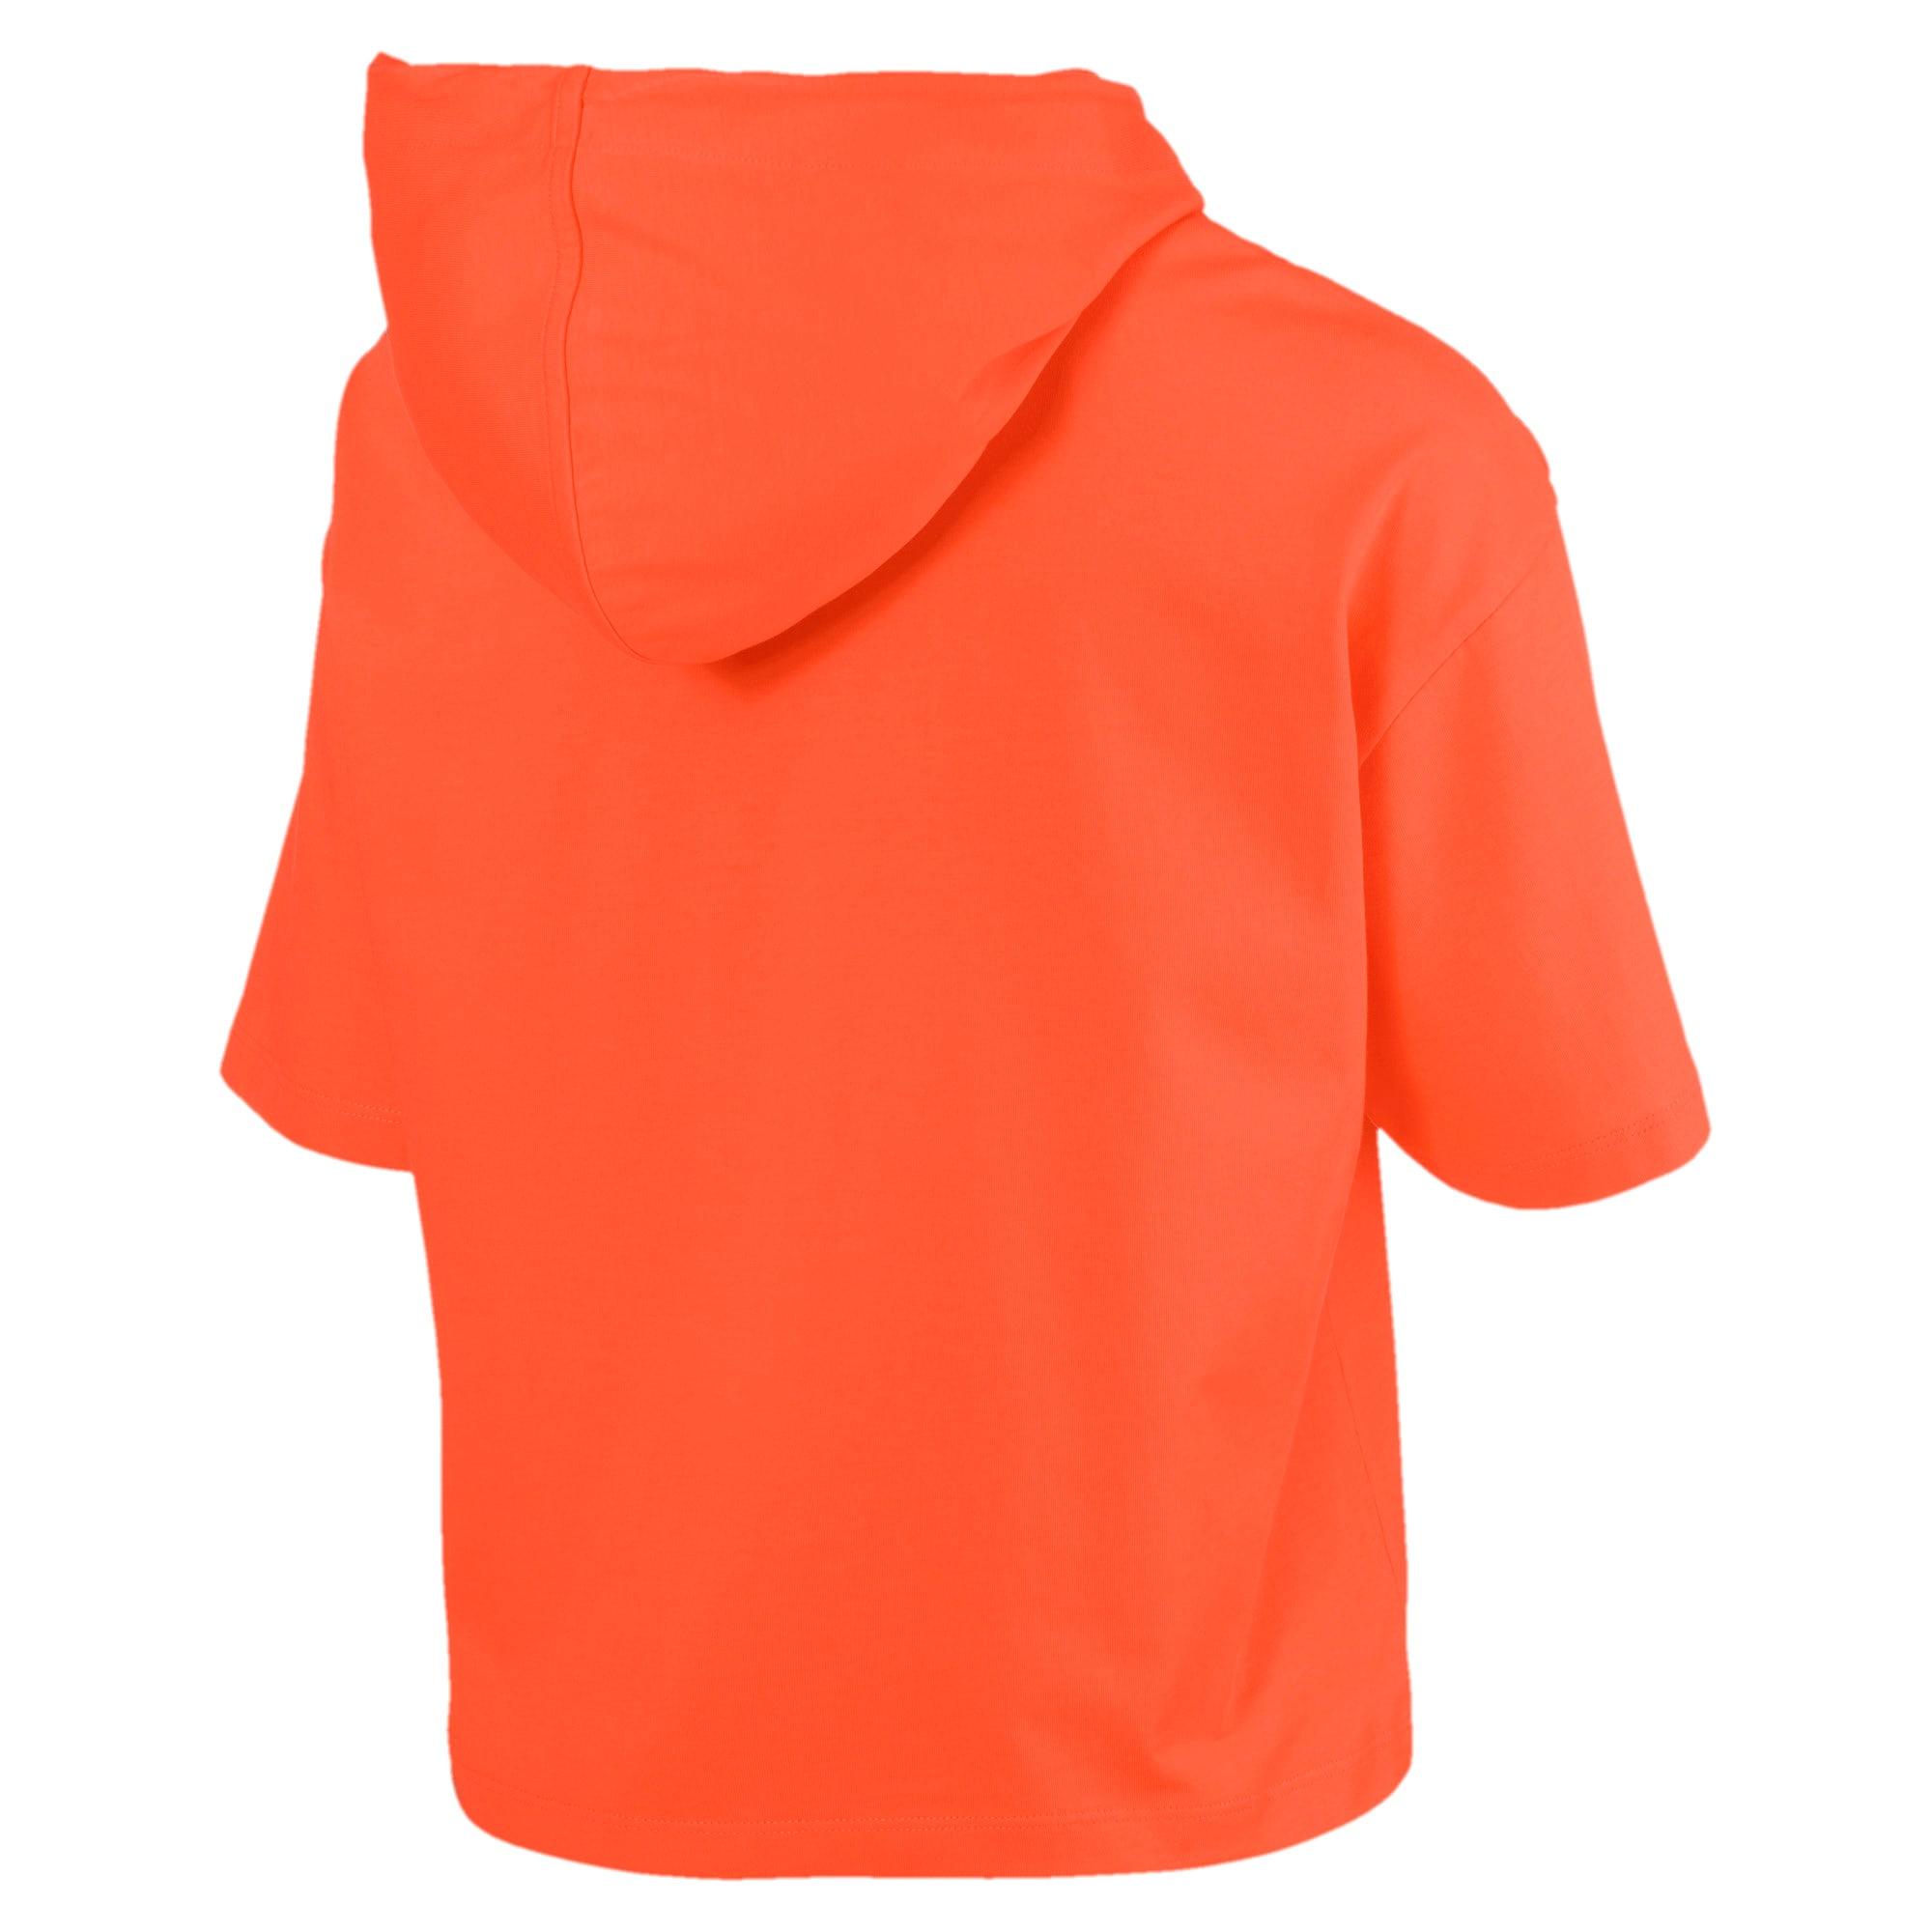 Thumbnail 4 of Classics Short Sleeve Hooded Women's Top, Nasturtium, medium